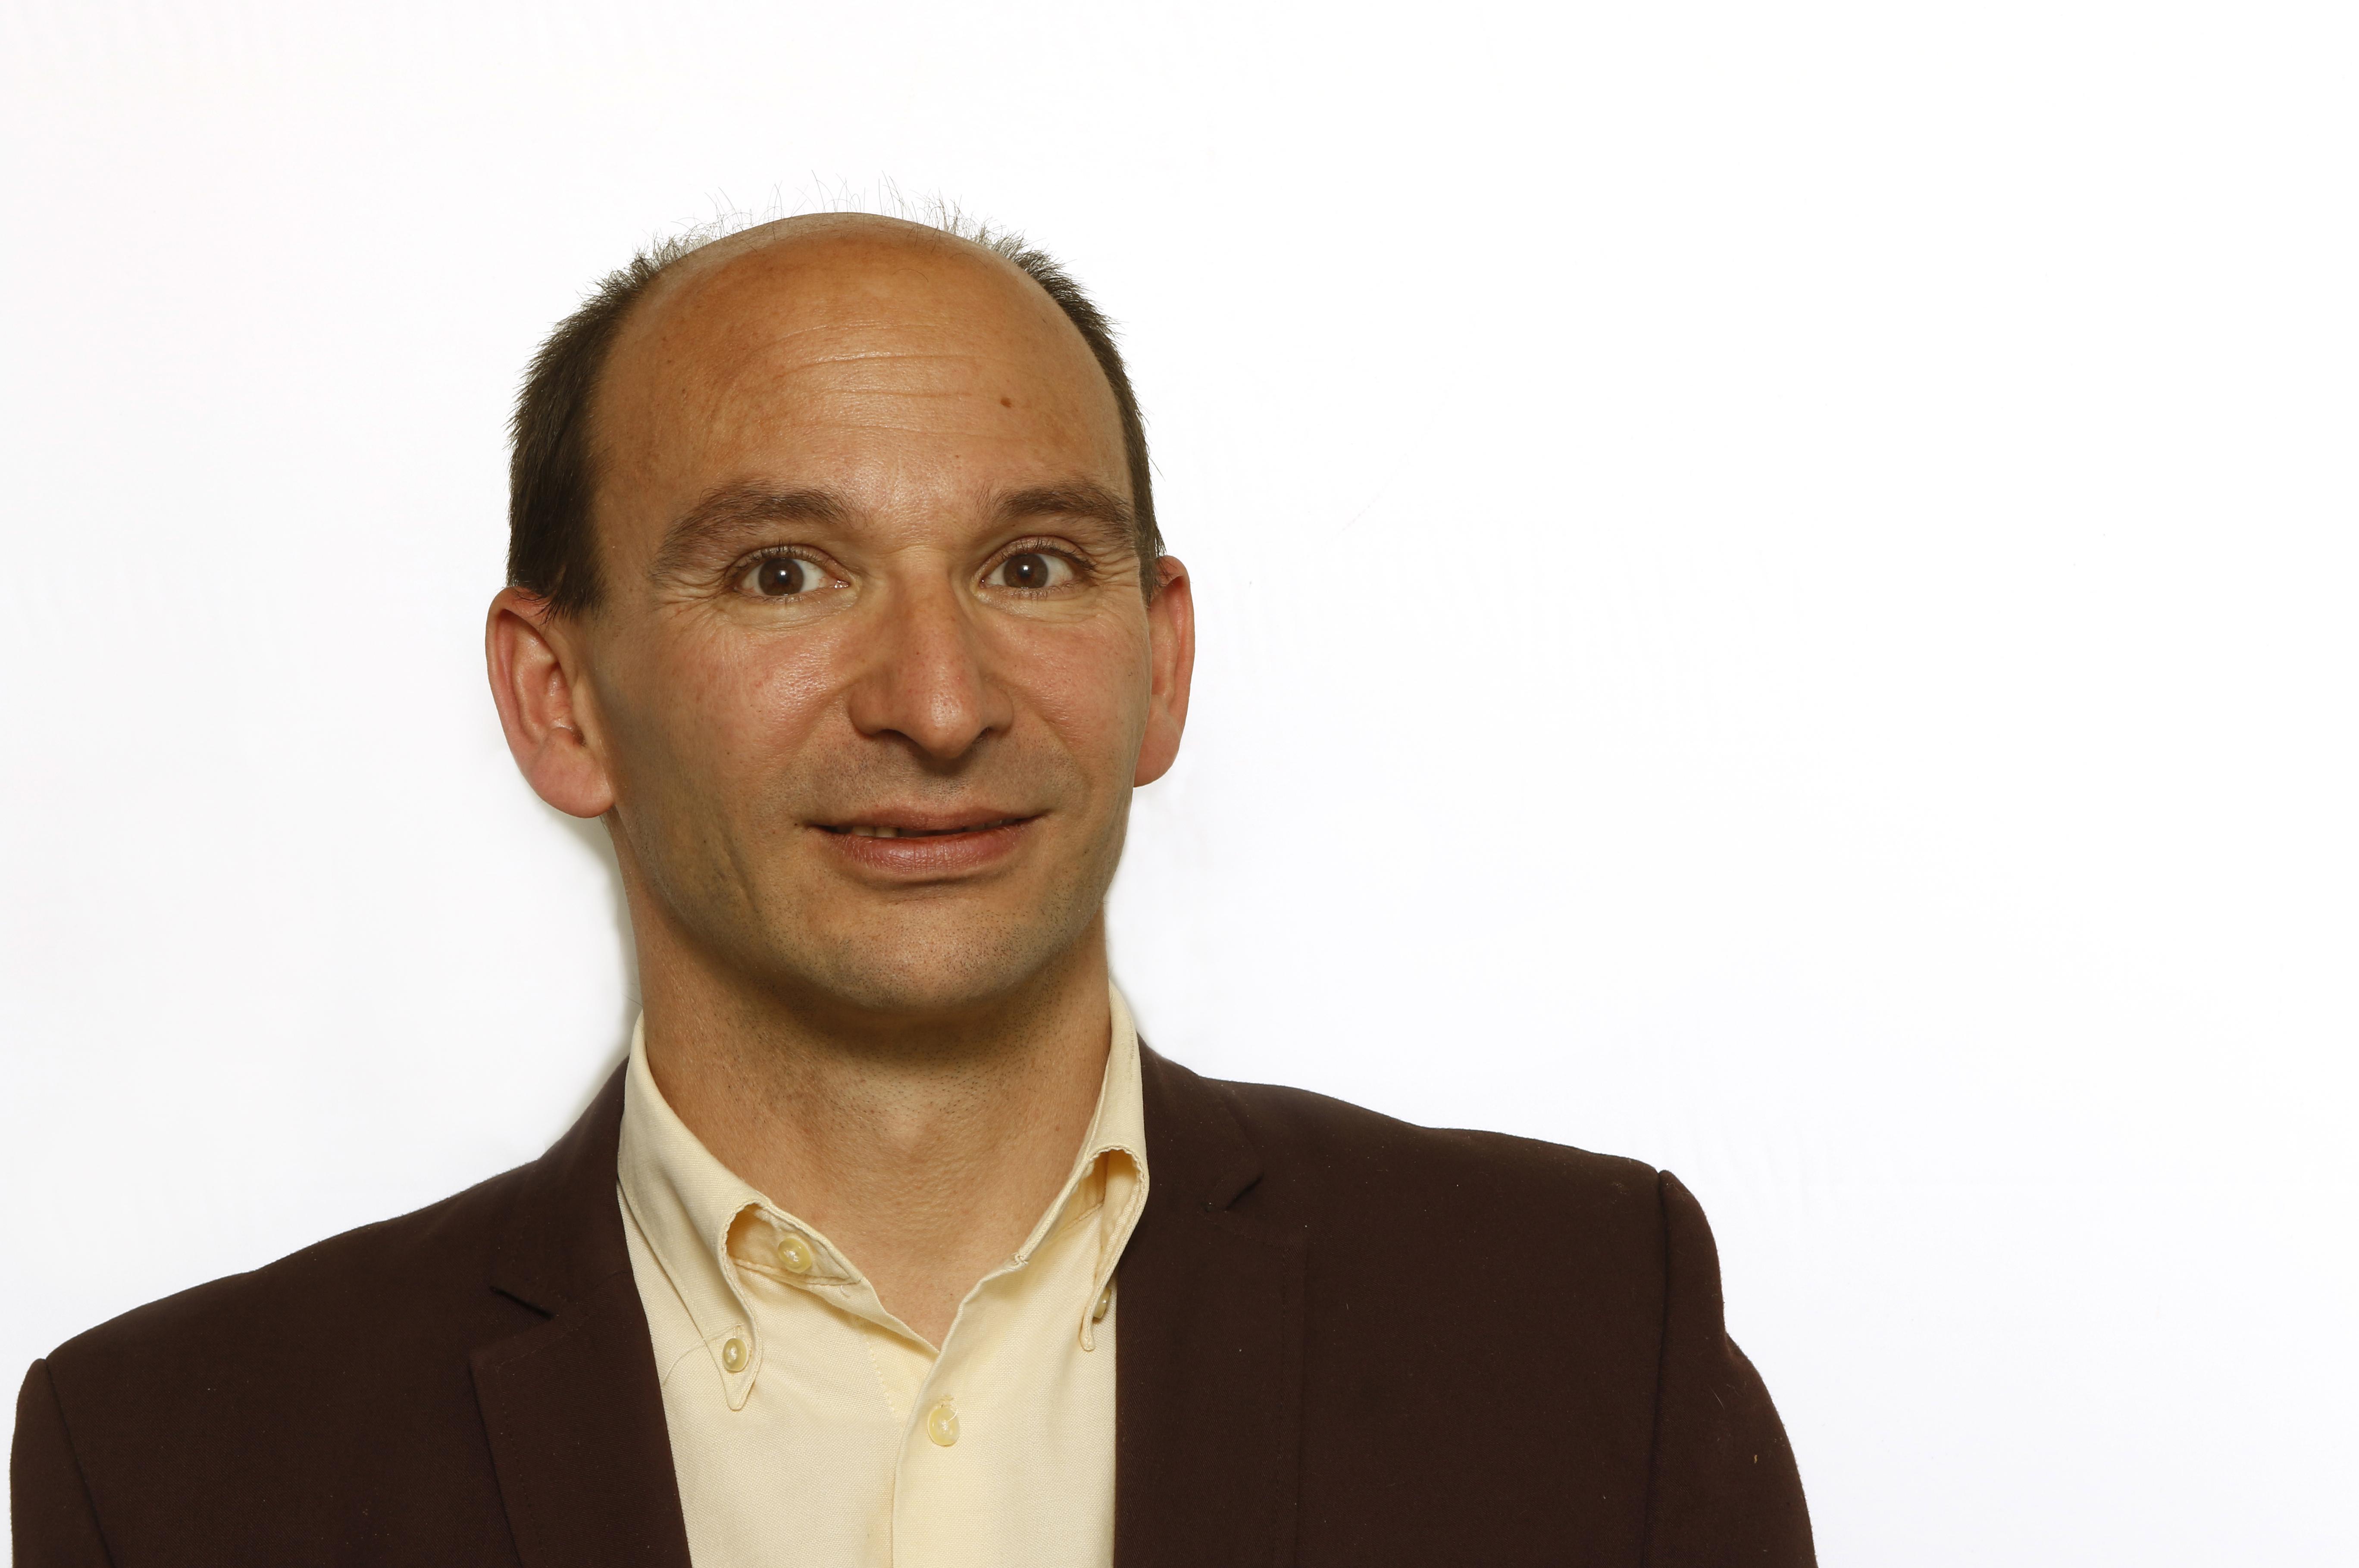 Cornelius Hagenmeier